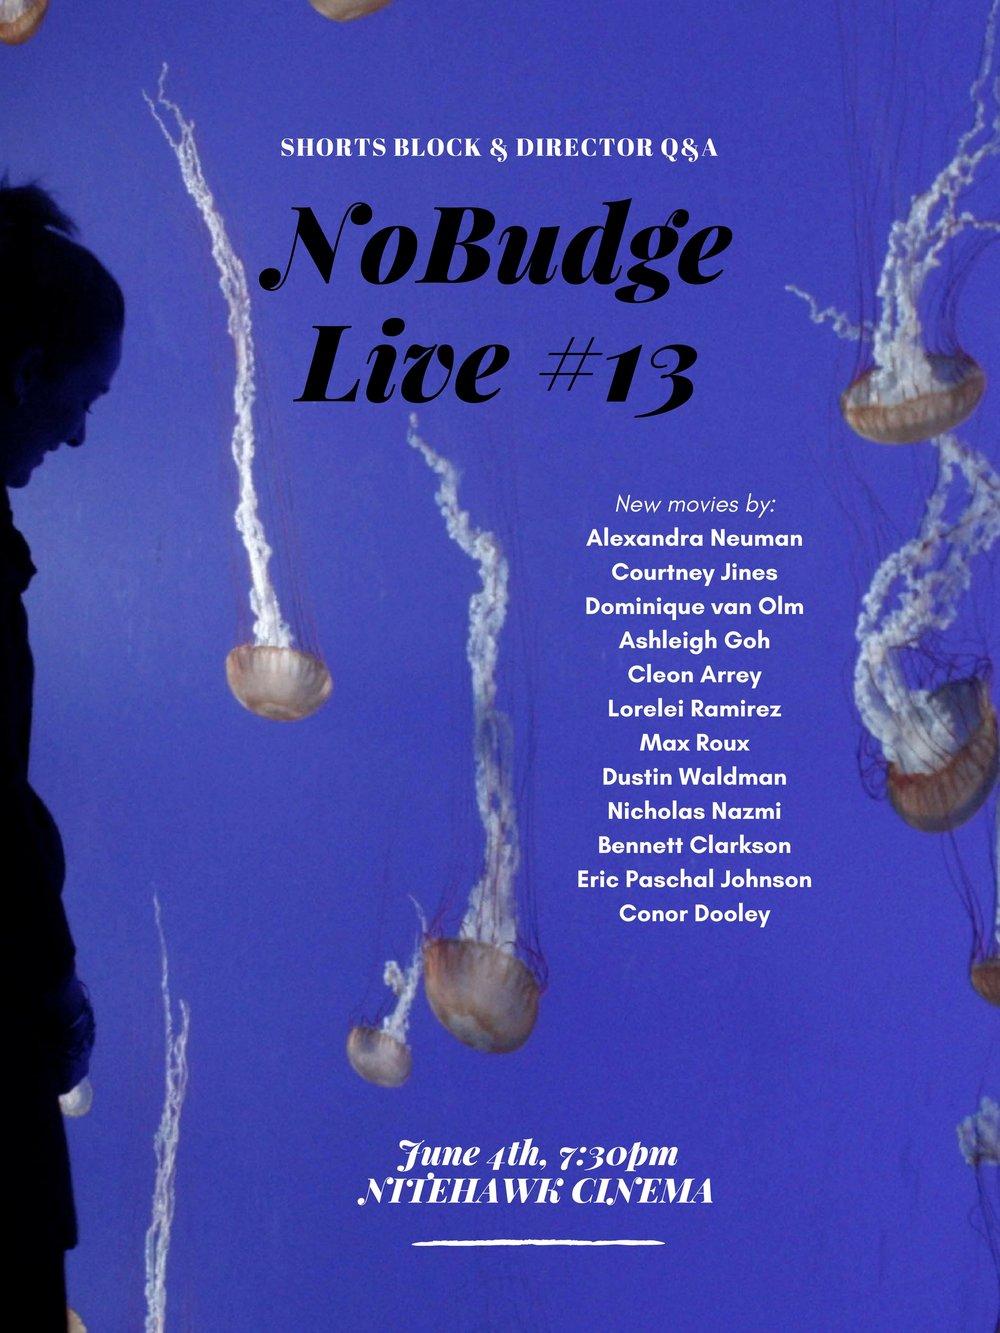 NoBudge Live #13 POSTER.jpg